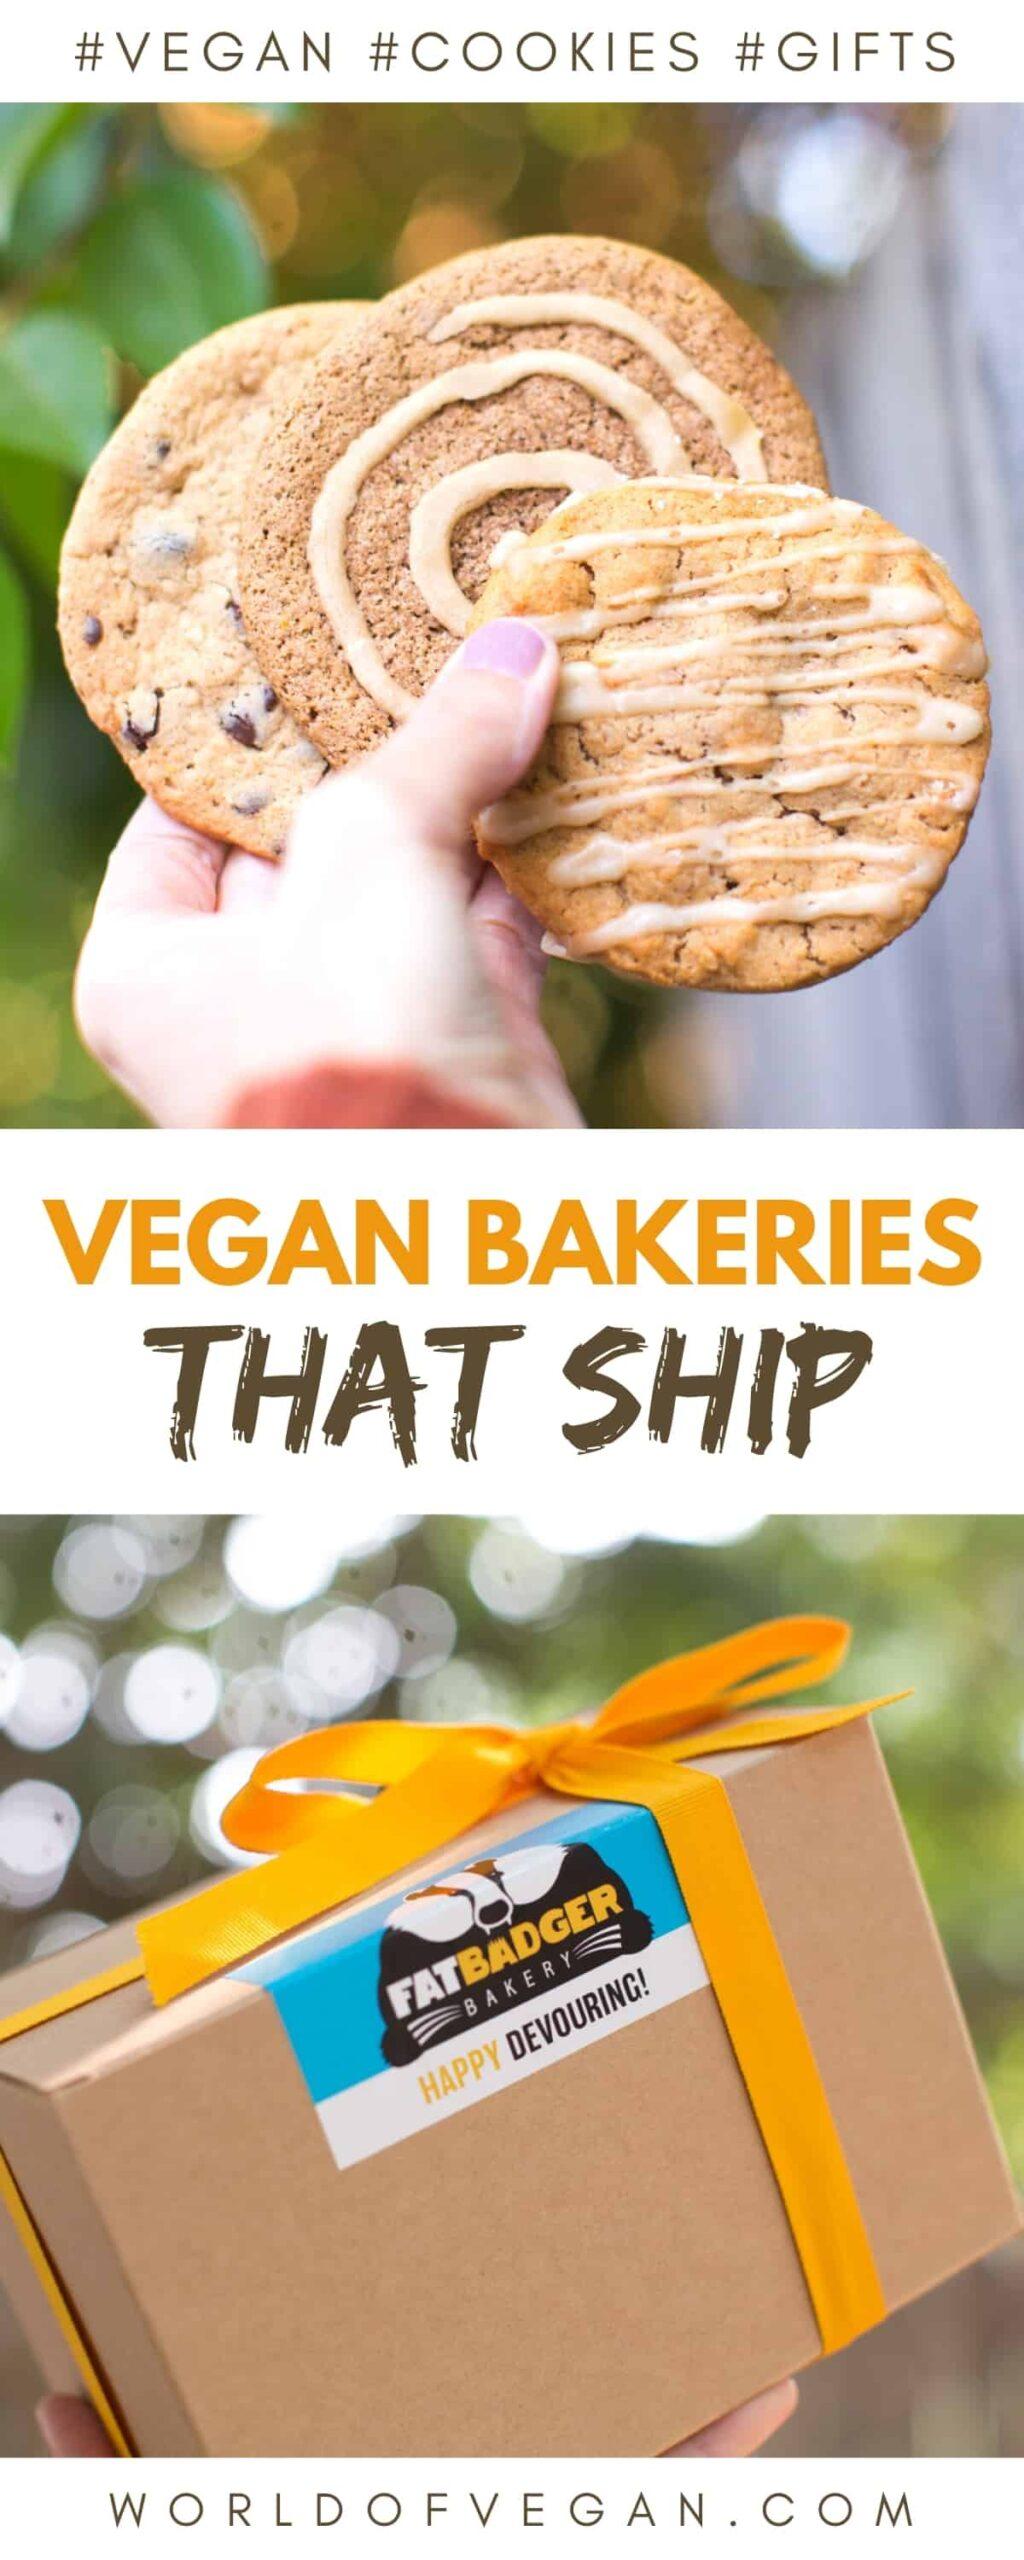 Vegan Bakeries that Ship Cookies, Cakes, Brownies and Beyond